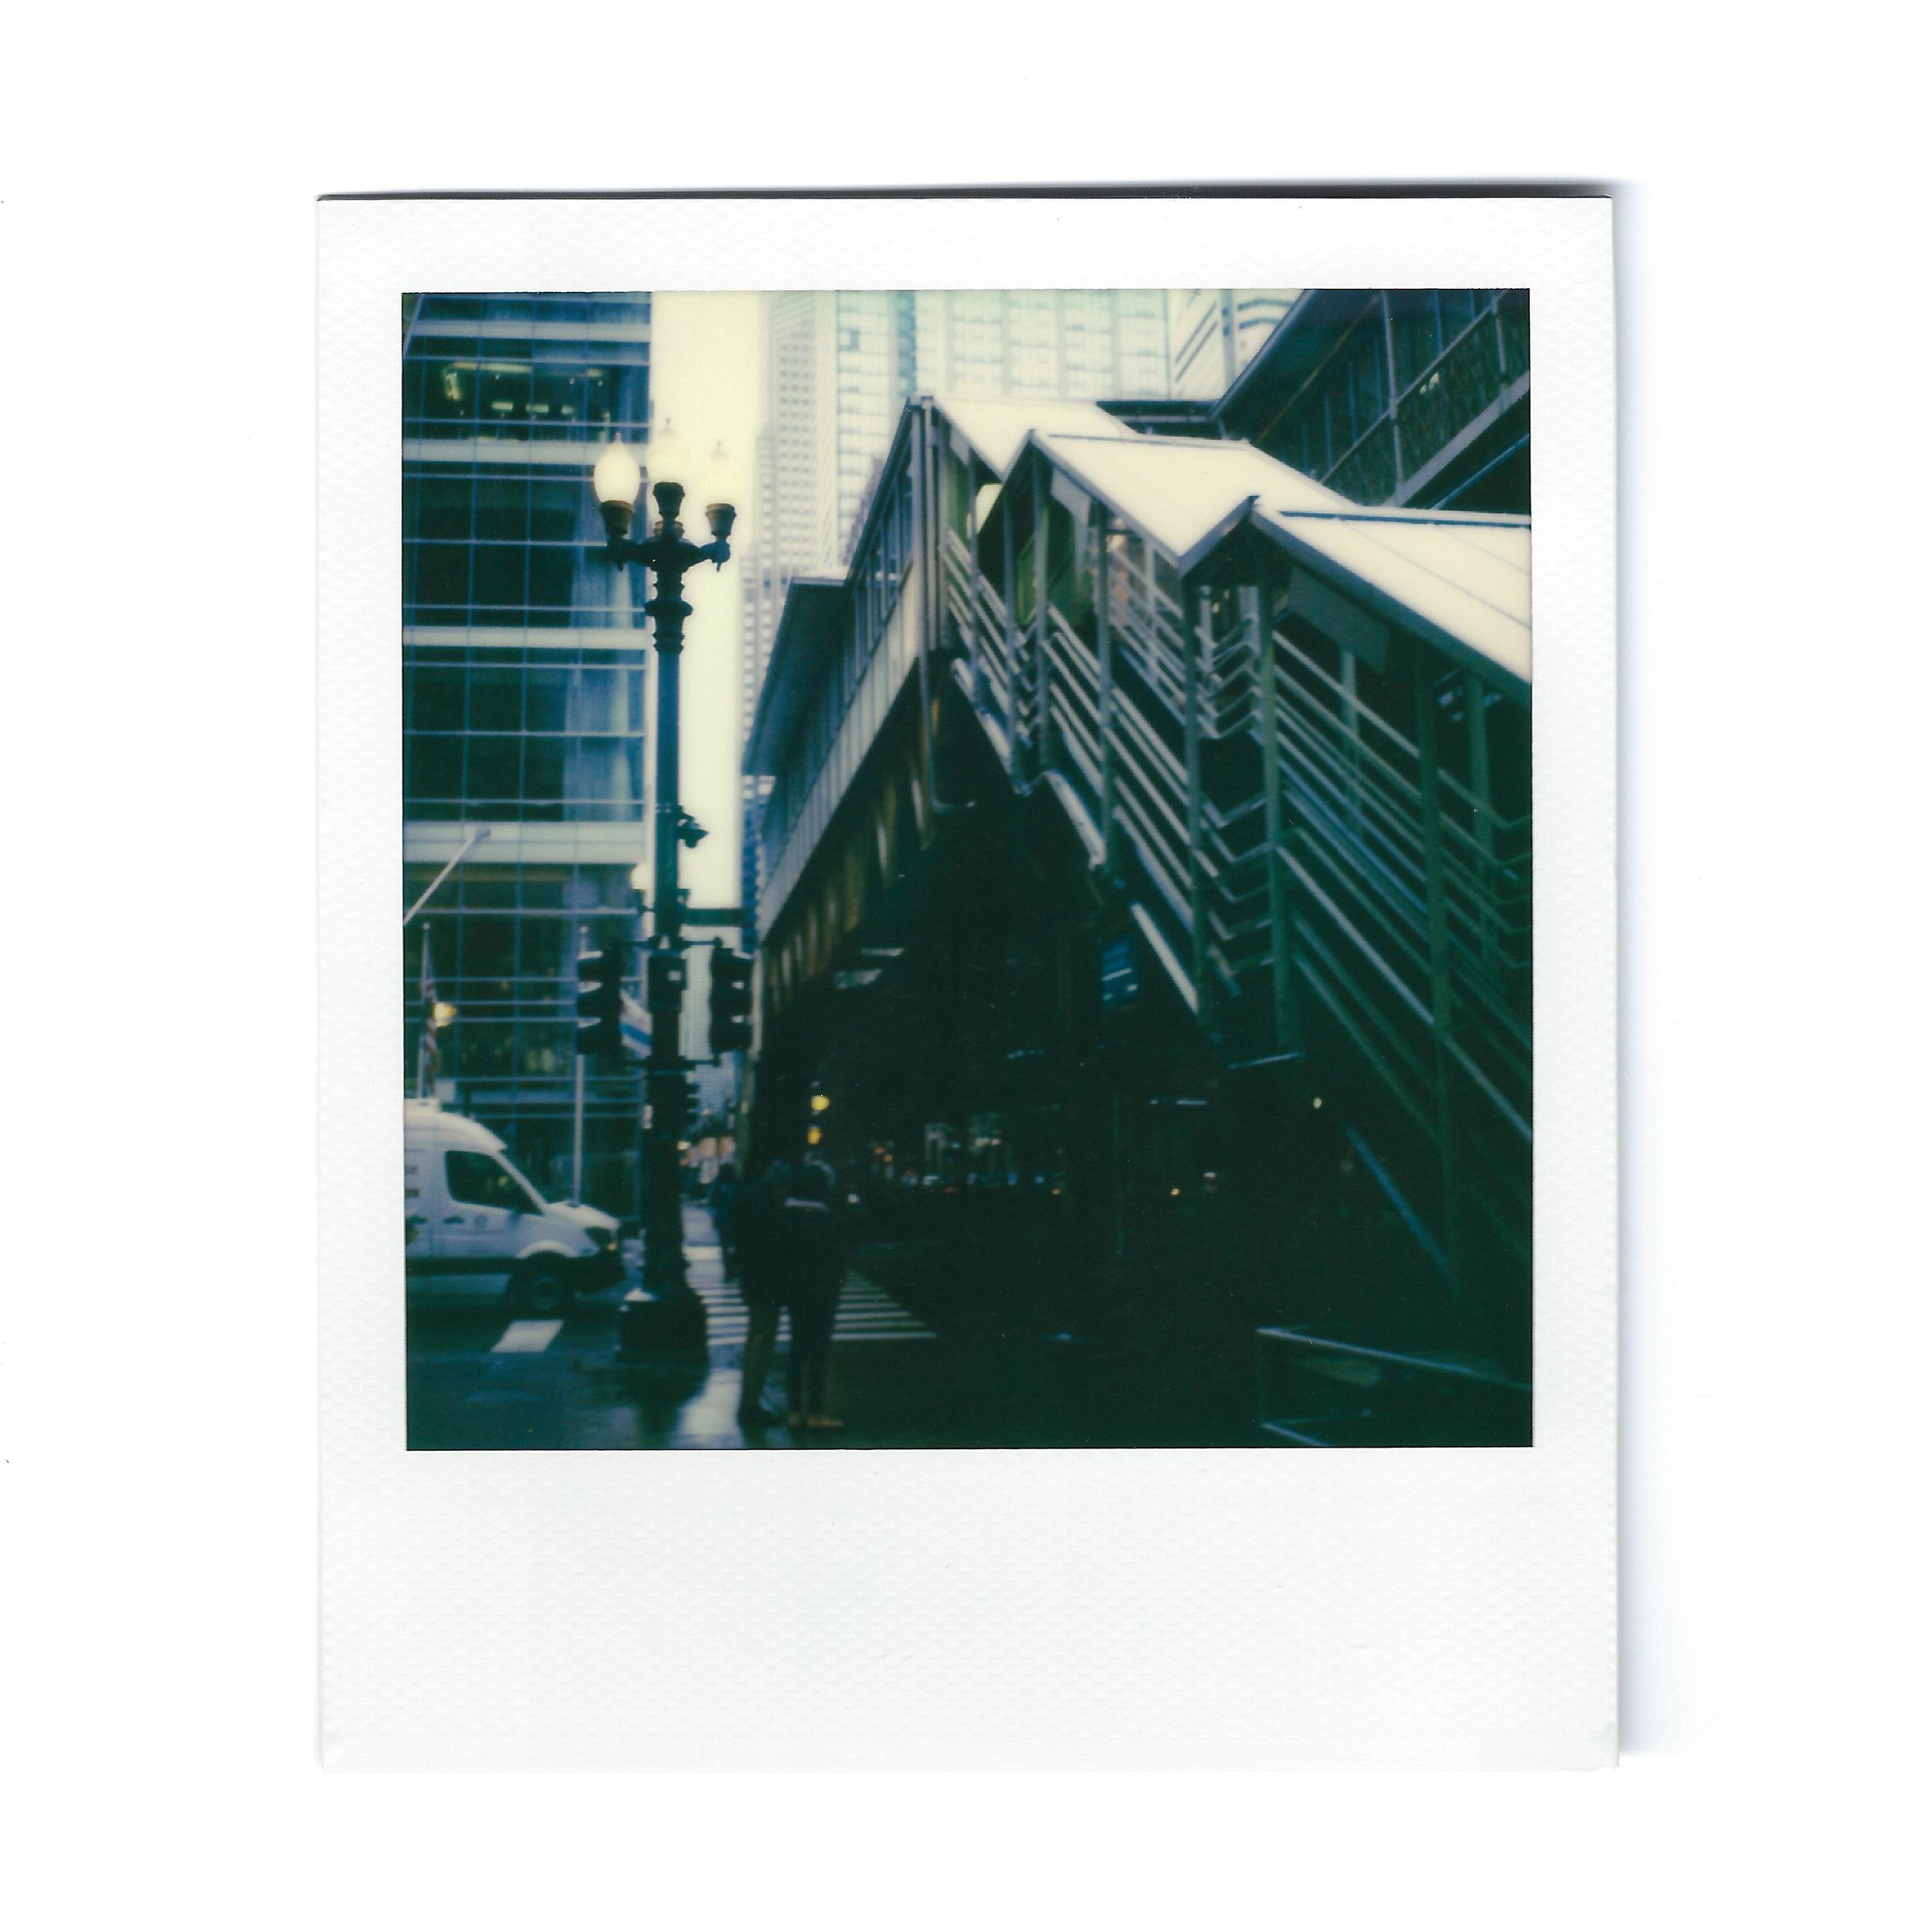 metra-chicago-polaroid.jpg